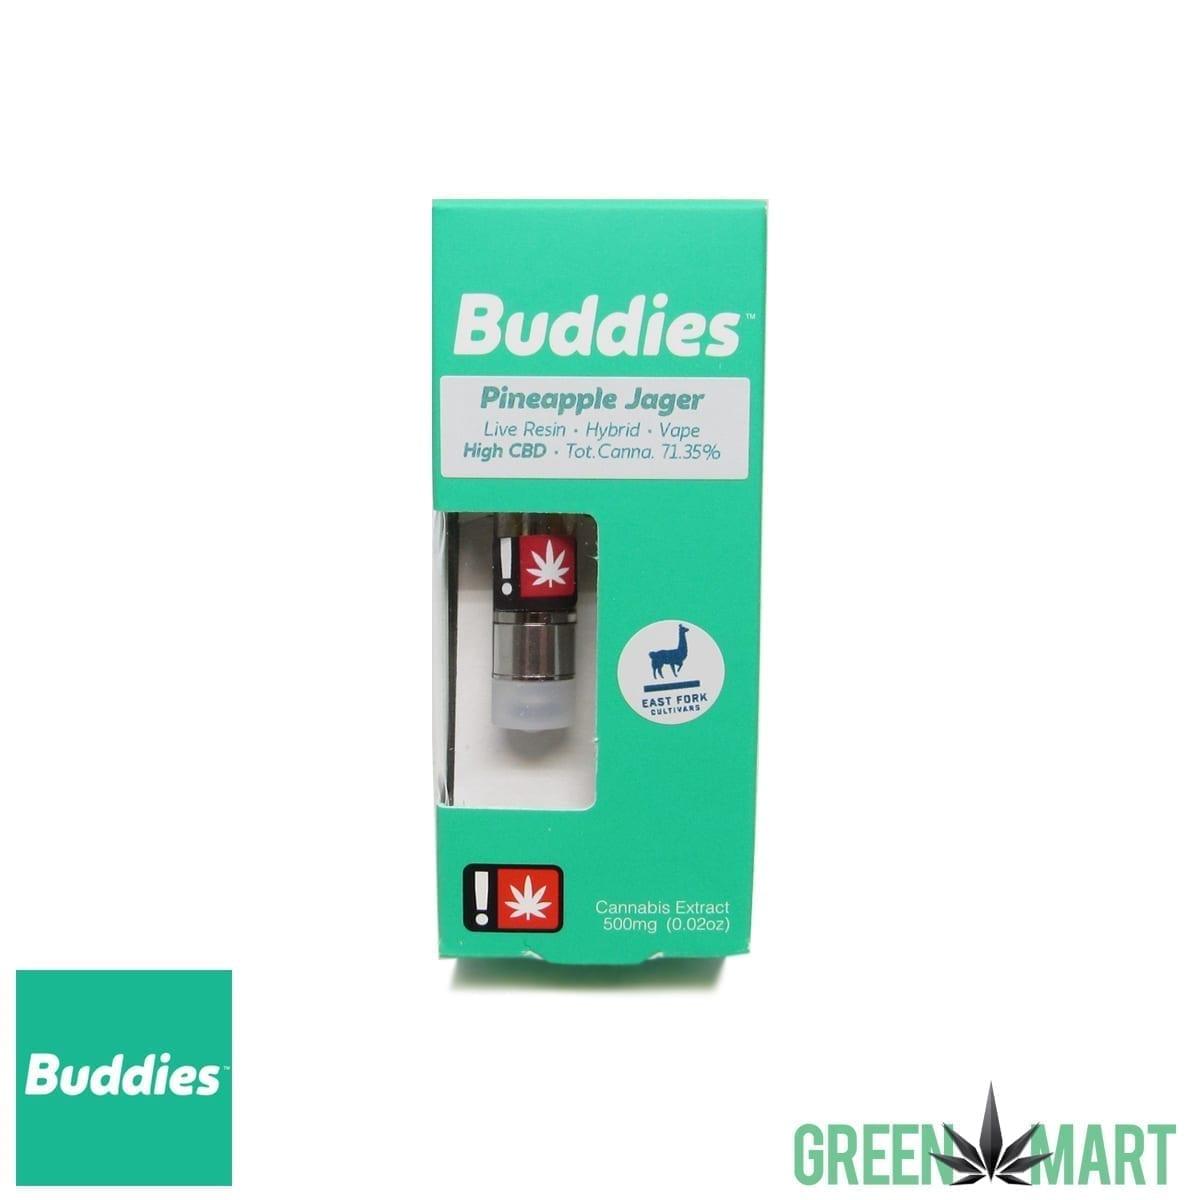 Buddies Brand Live Resin Cartridge - Pineapple Jager